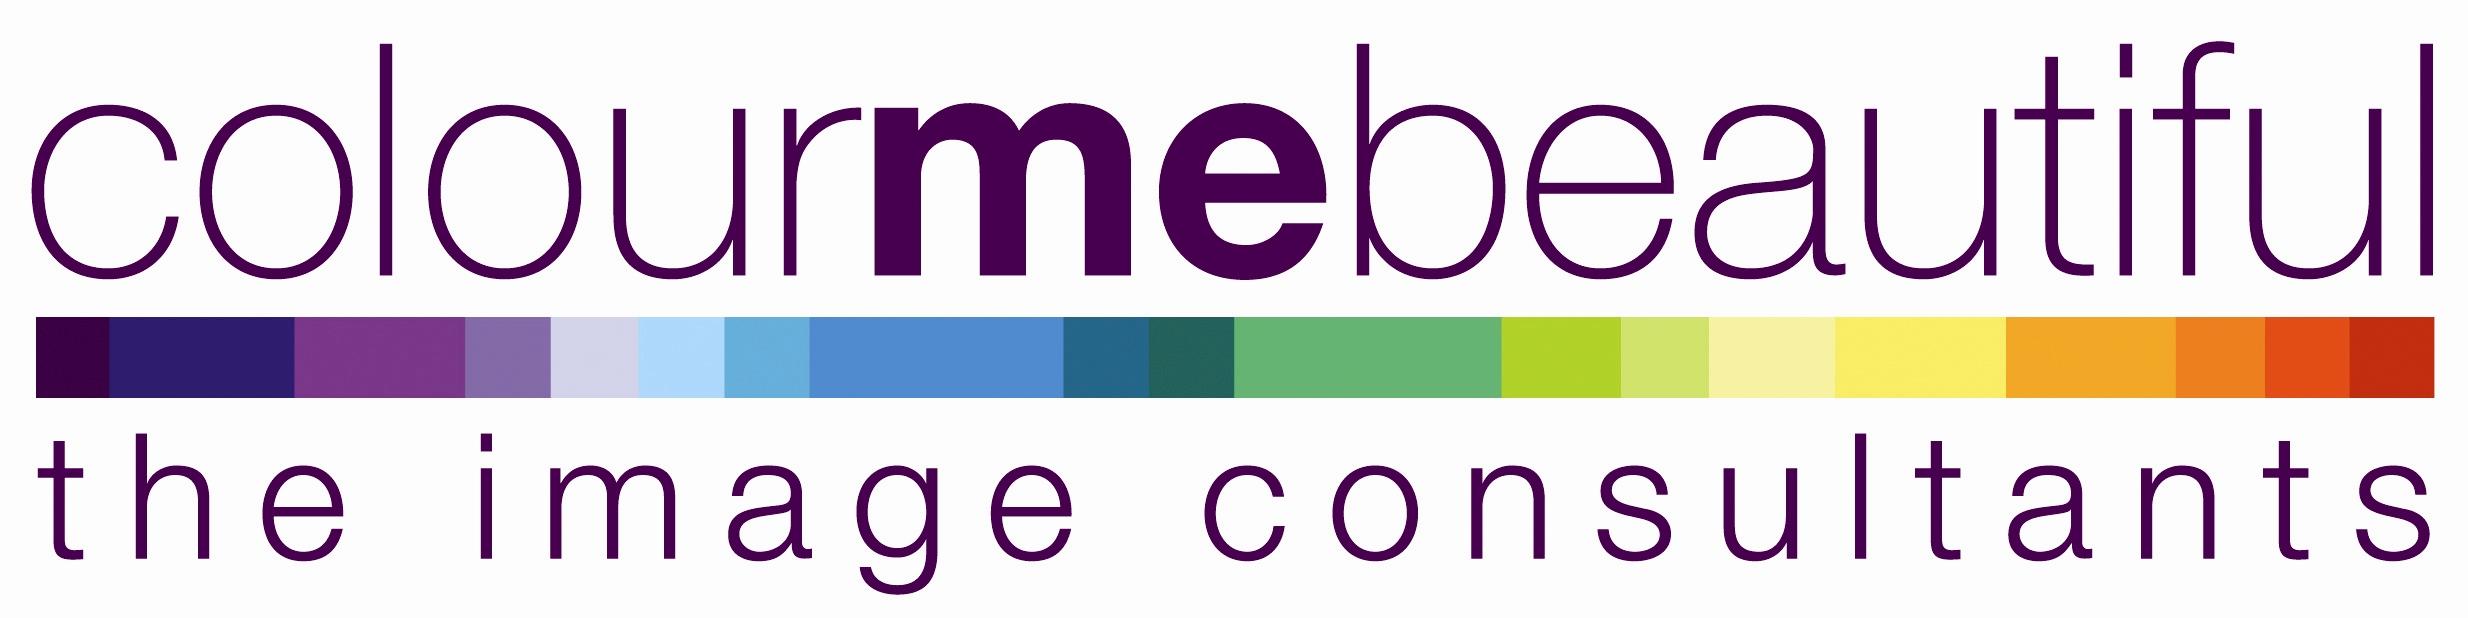 1. CMB Logo - large